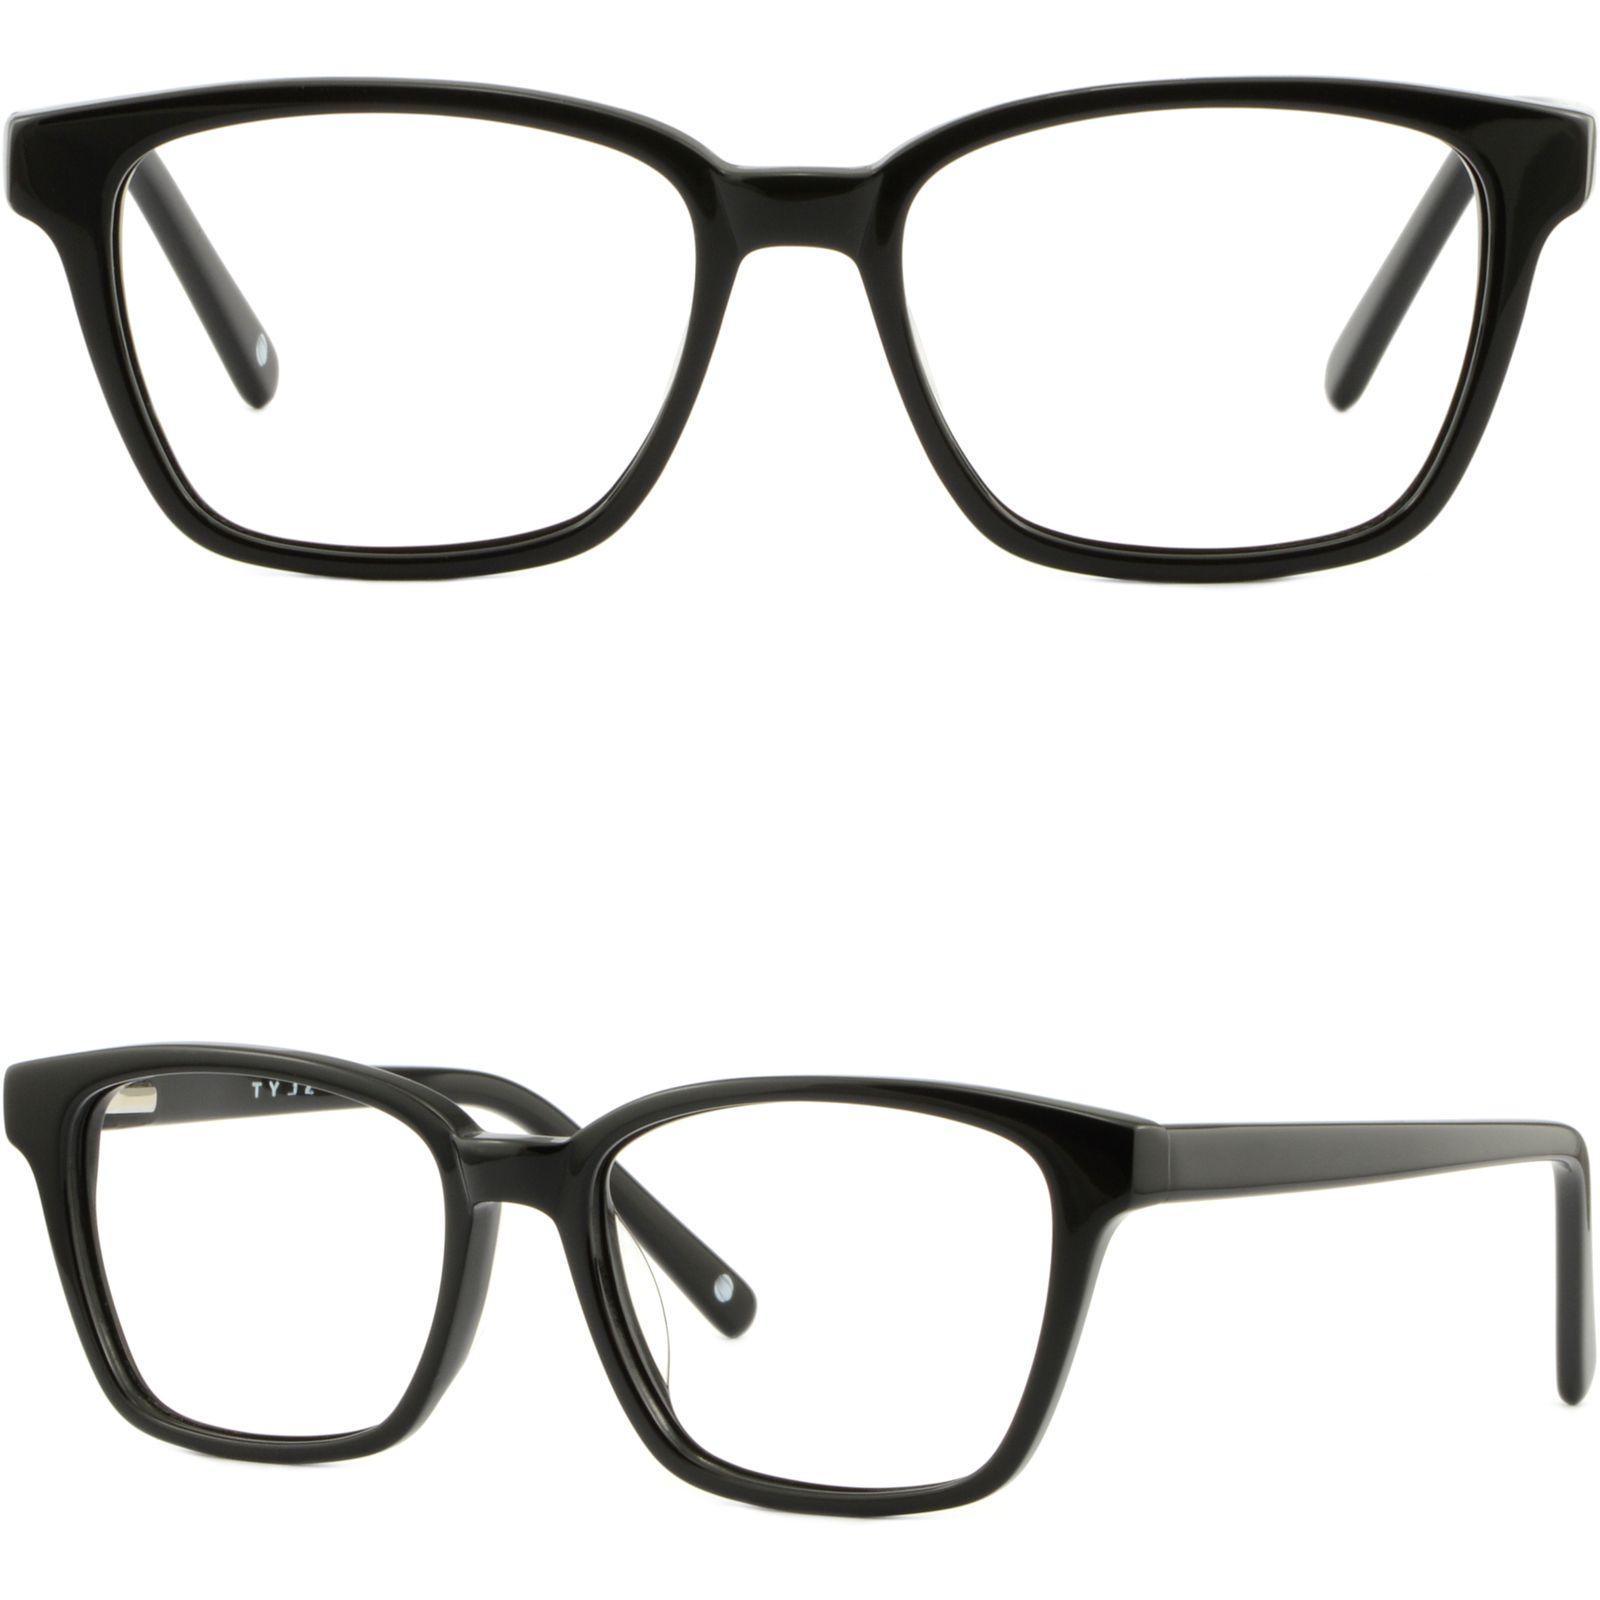 square teens women plastic frame spring loaded hinges glasses black prodesign eyeglass frames rimless eyeglass frames for women from aceglasses